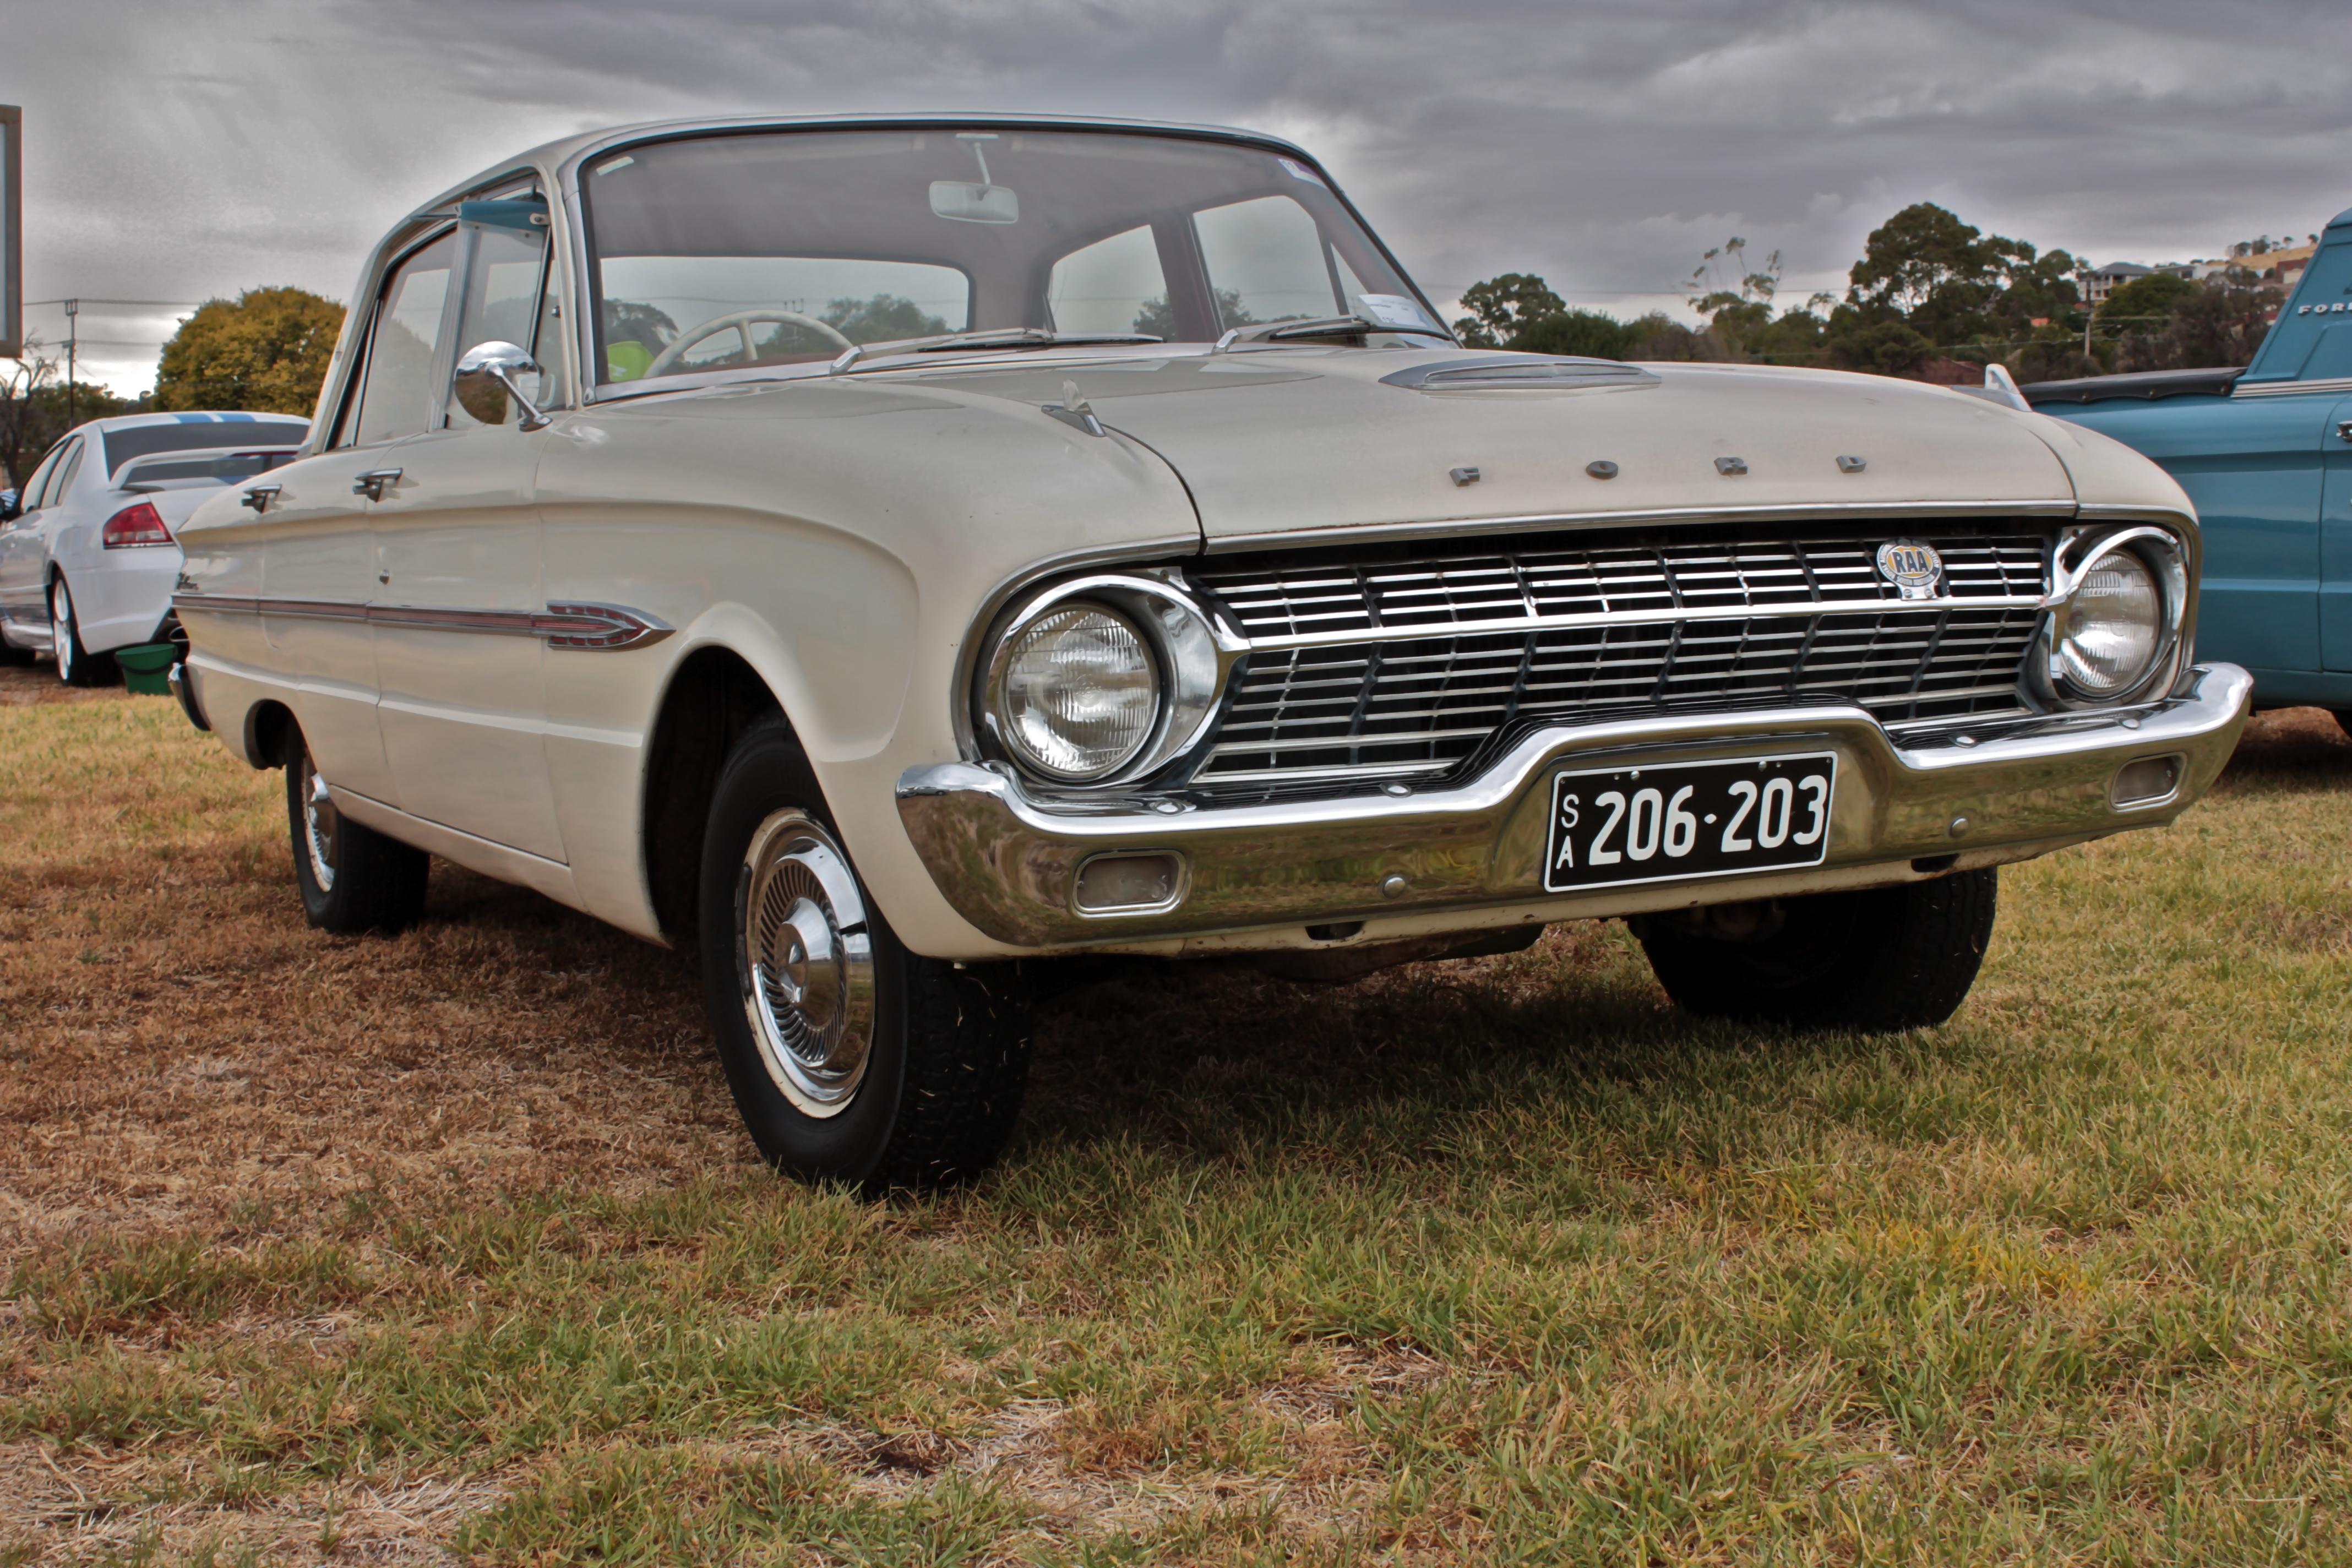 1962 Ford XL Falcon Futura Sedan